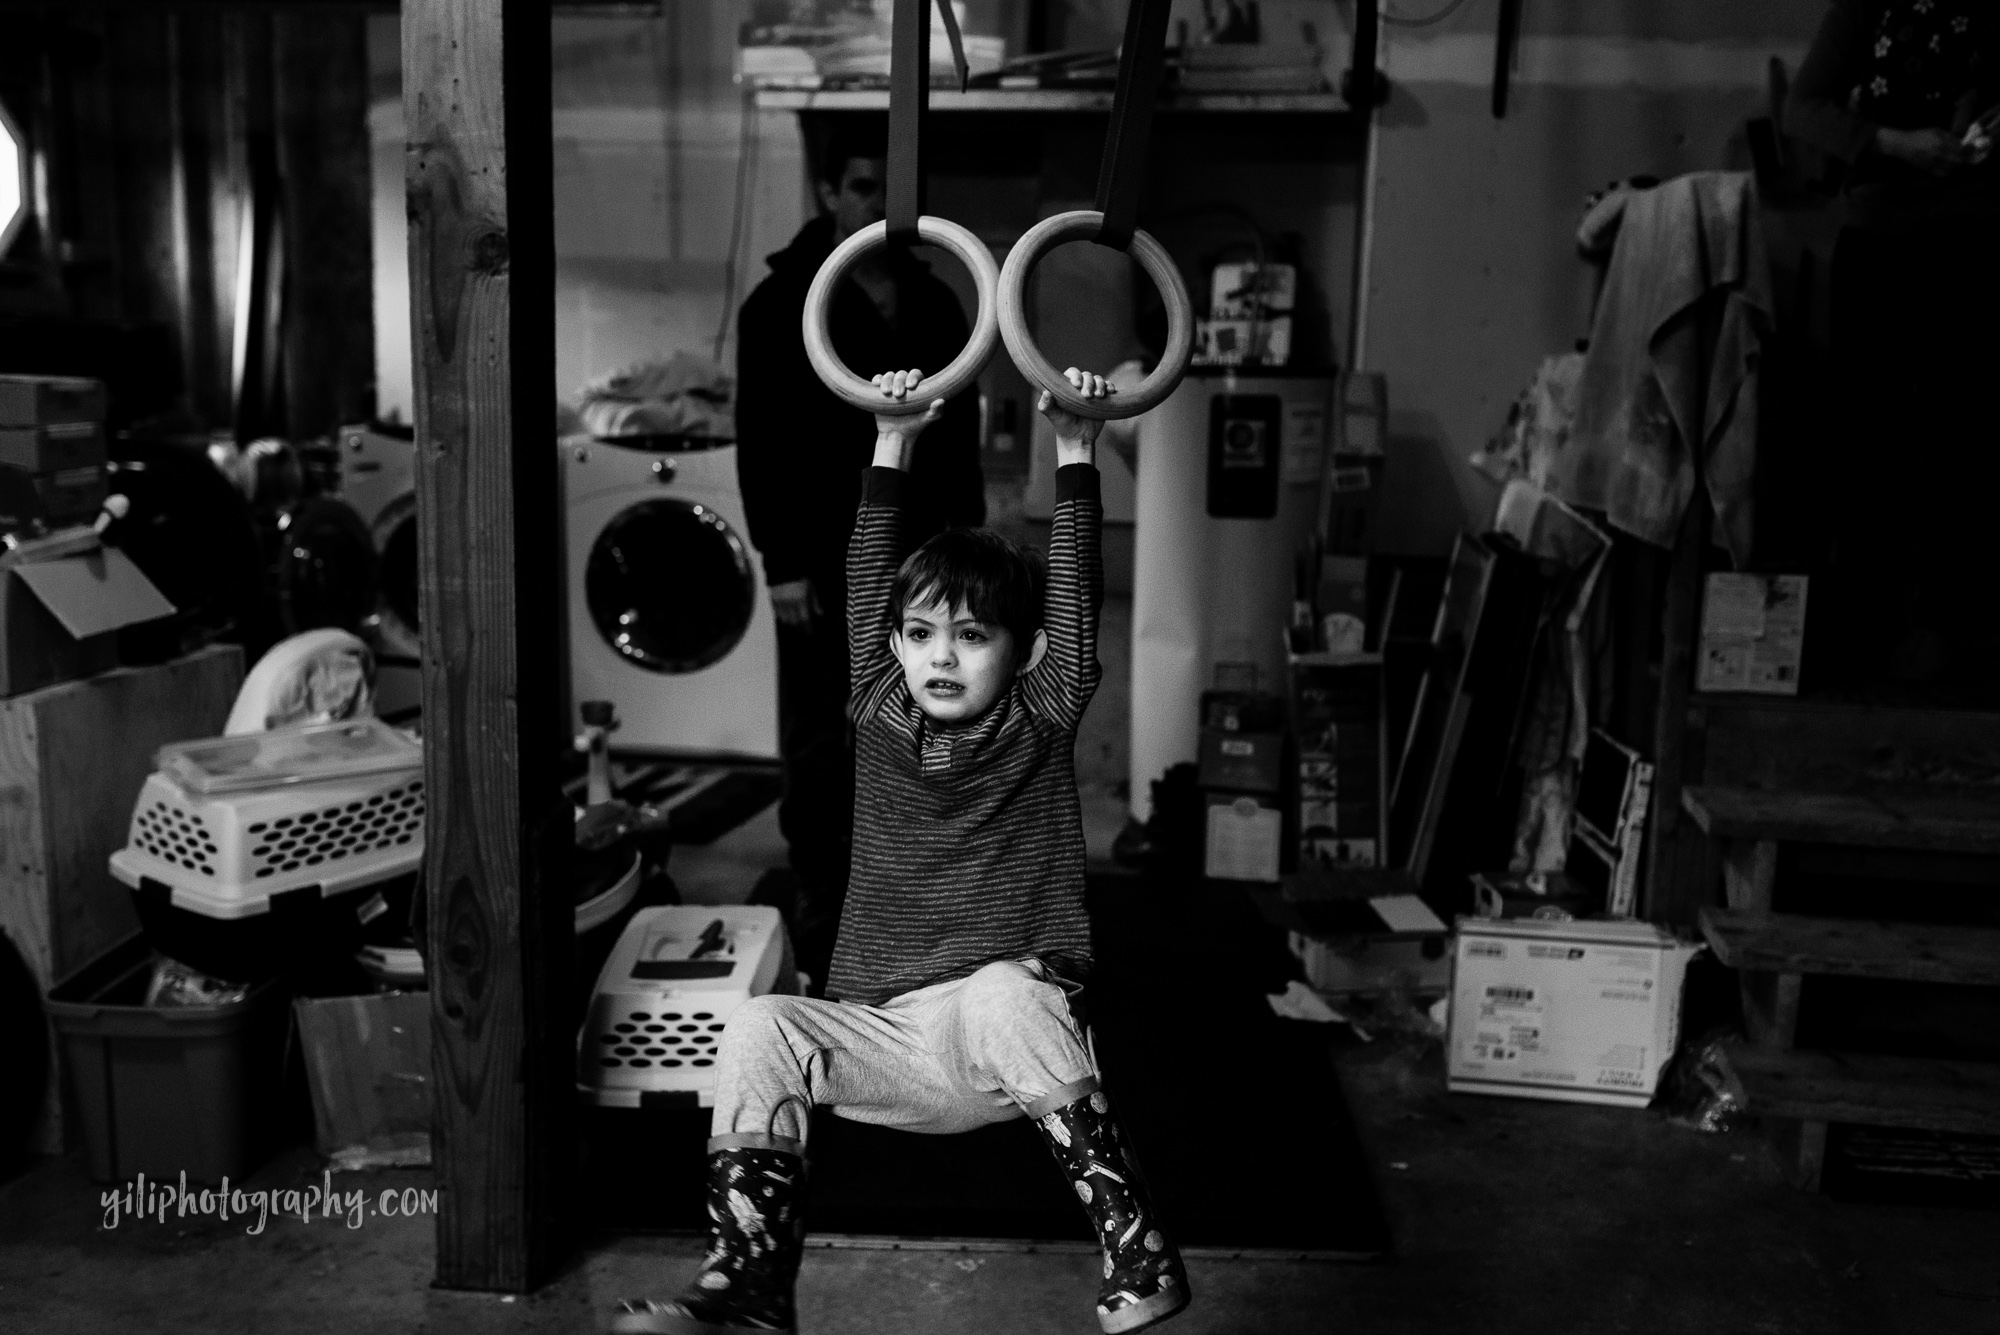 seattle toddler swinging on gymnastics rings